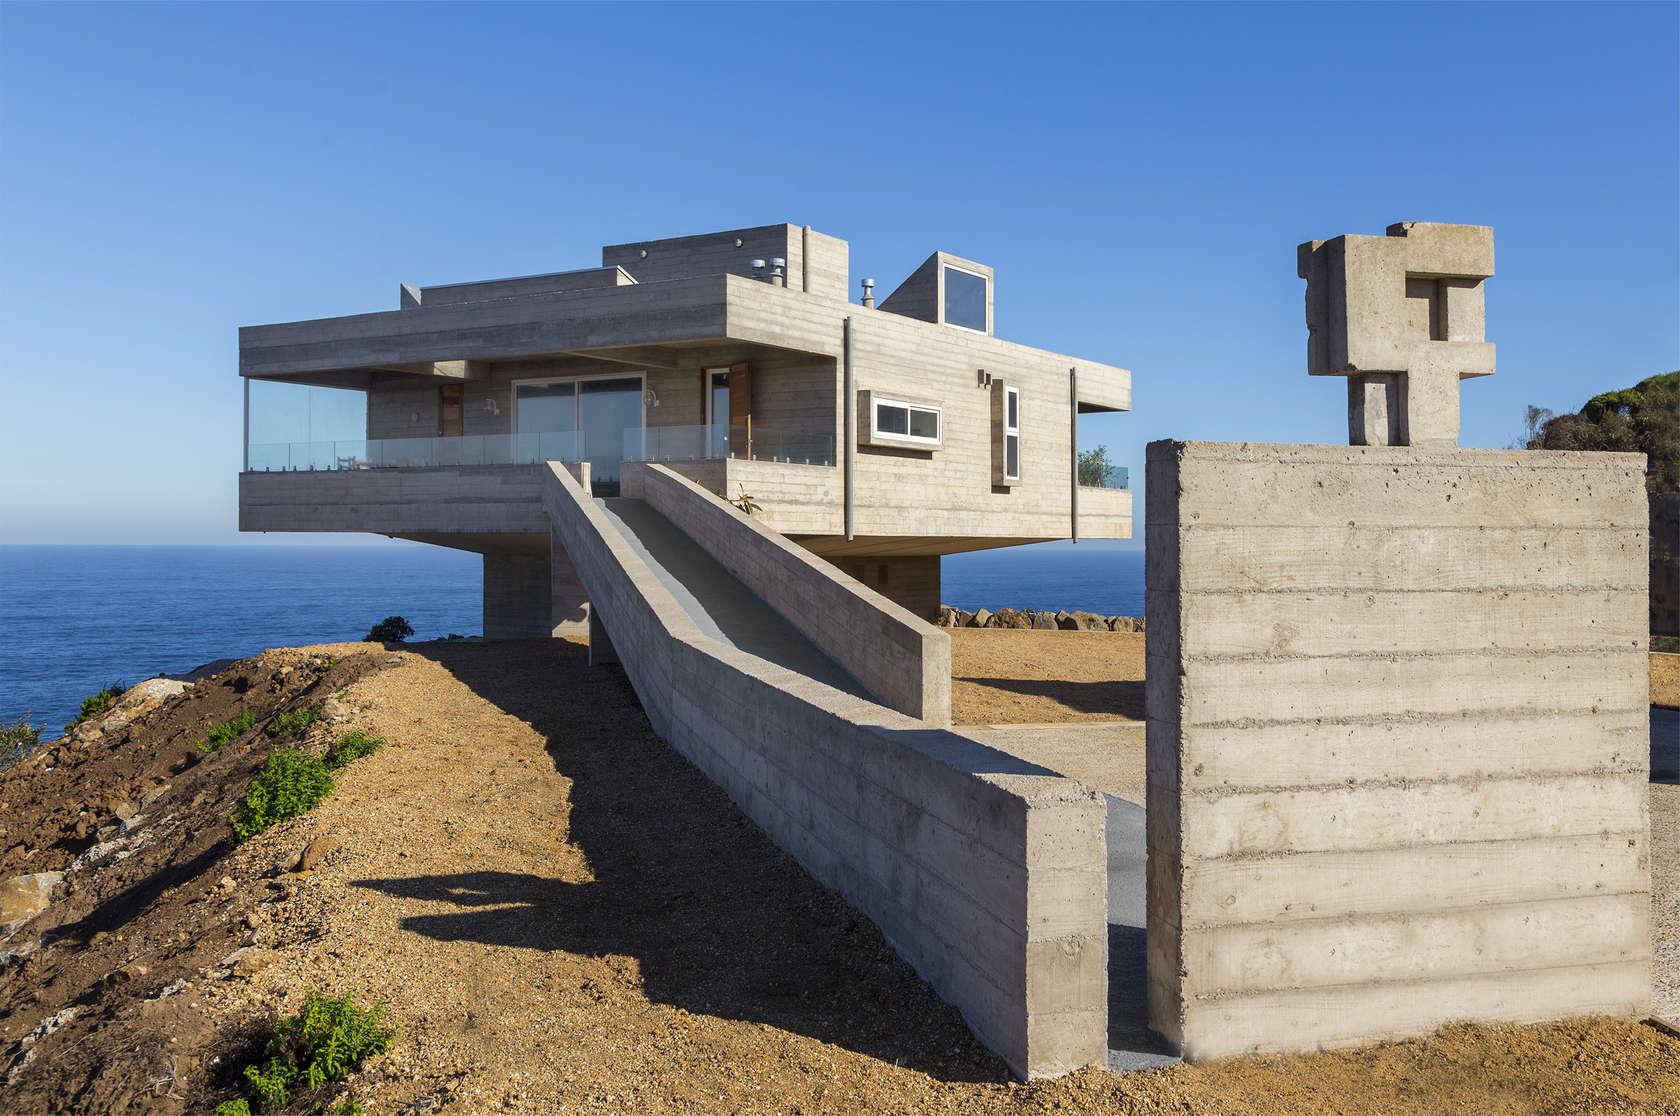 house plans on concrete slabs - Slab Home Designs